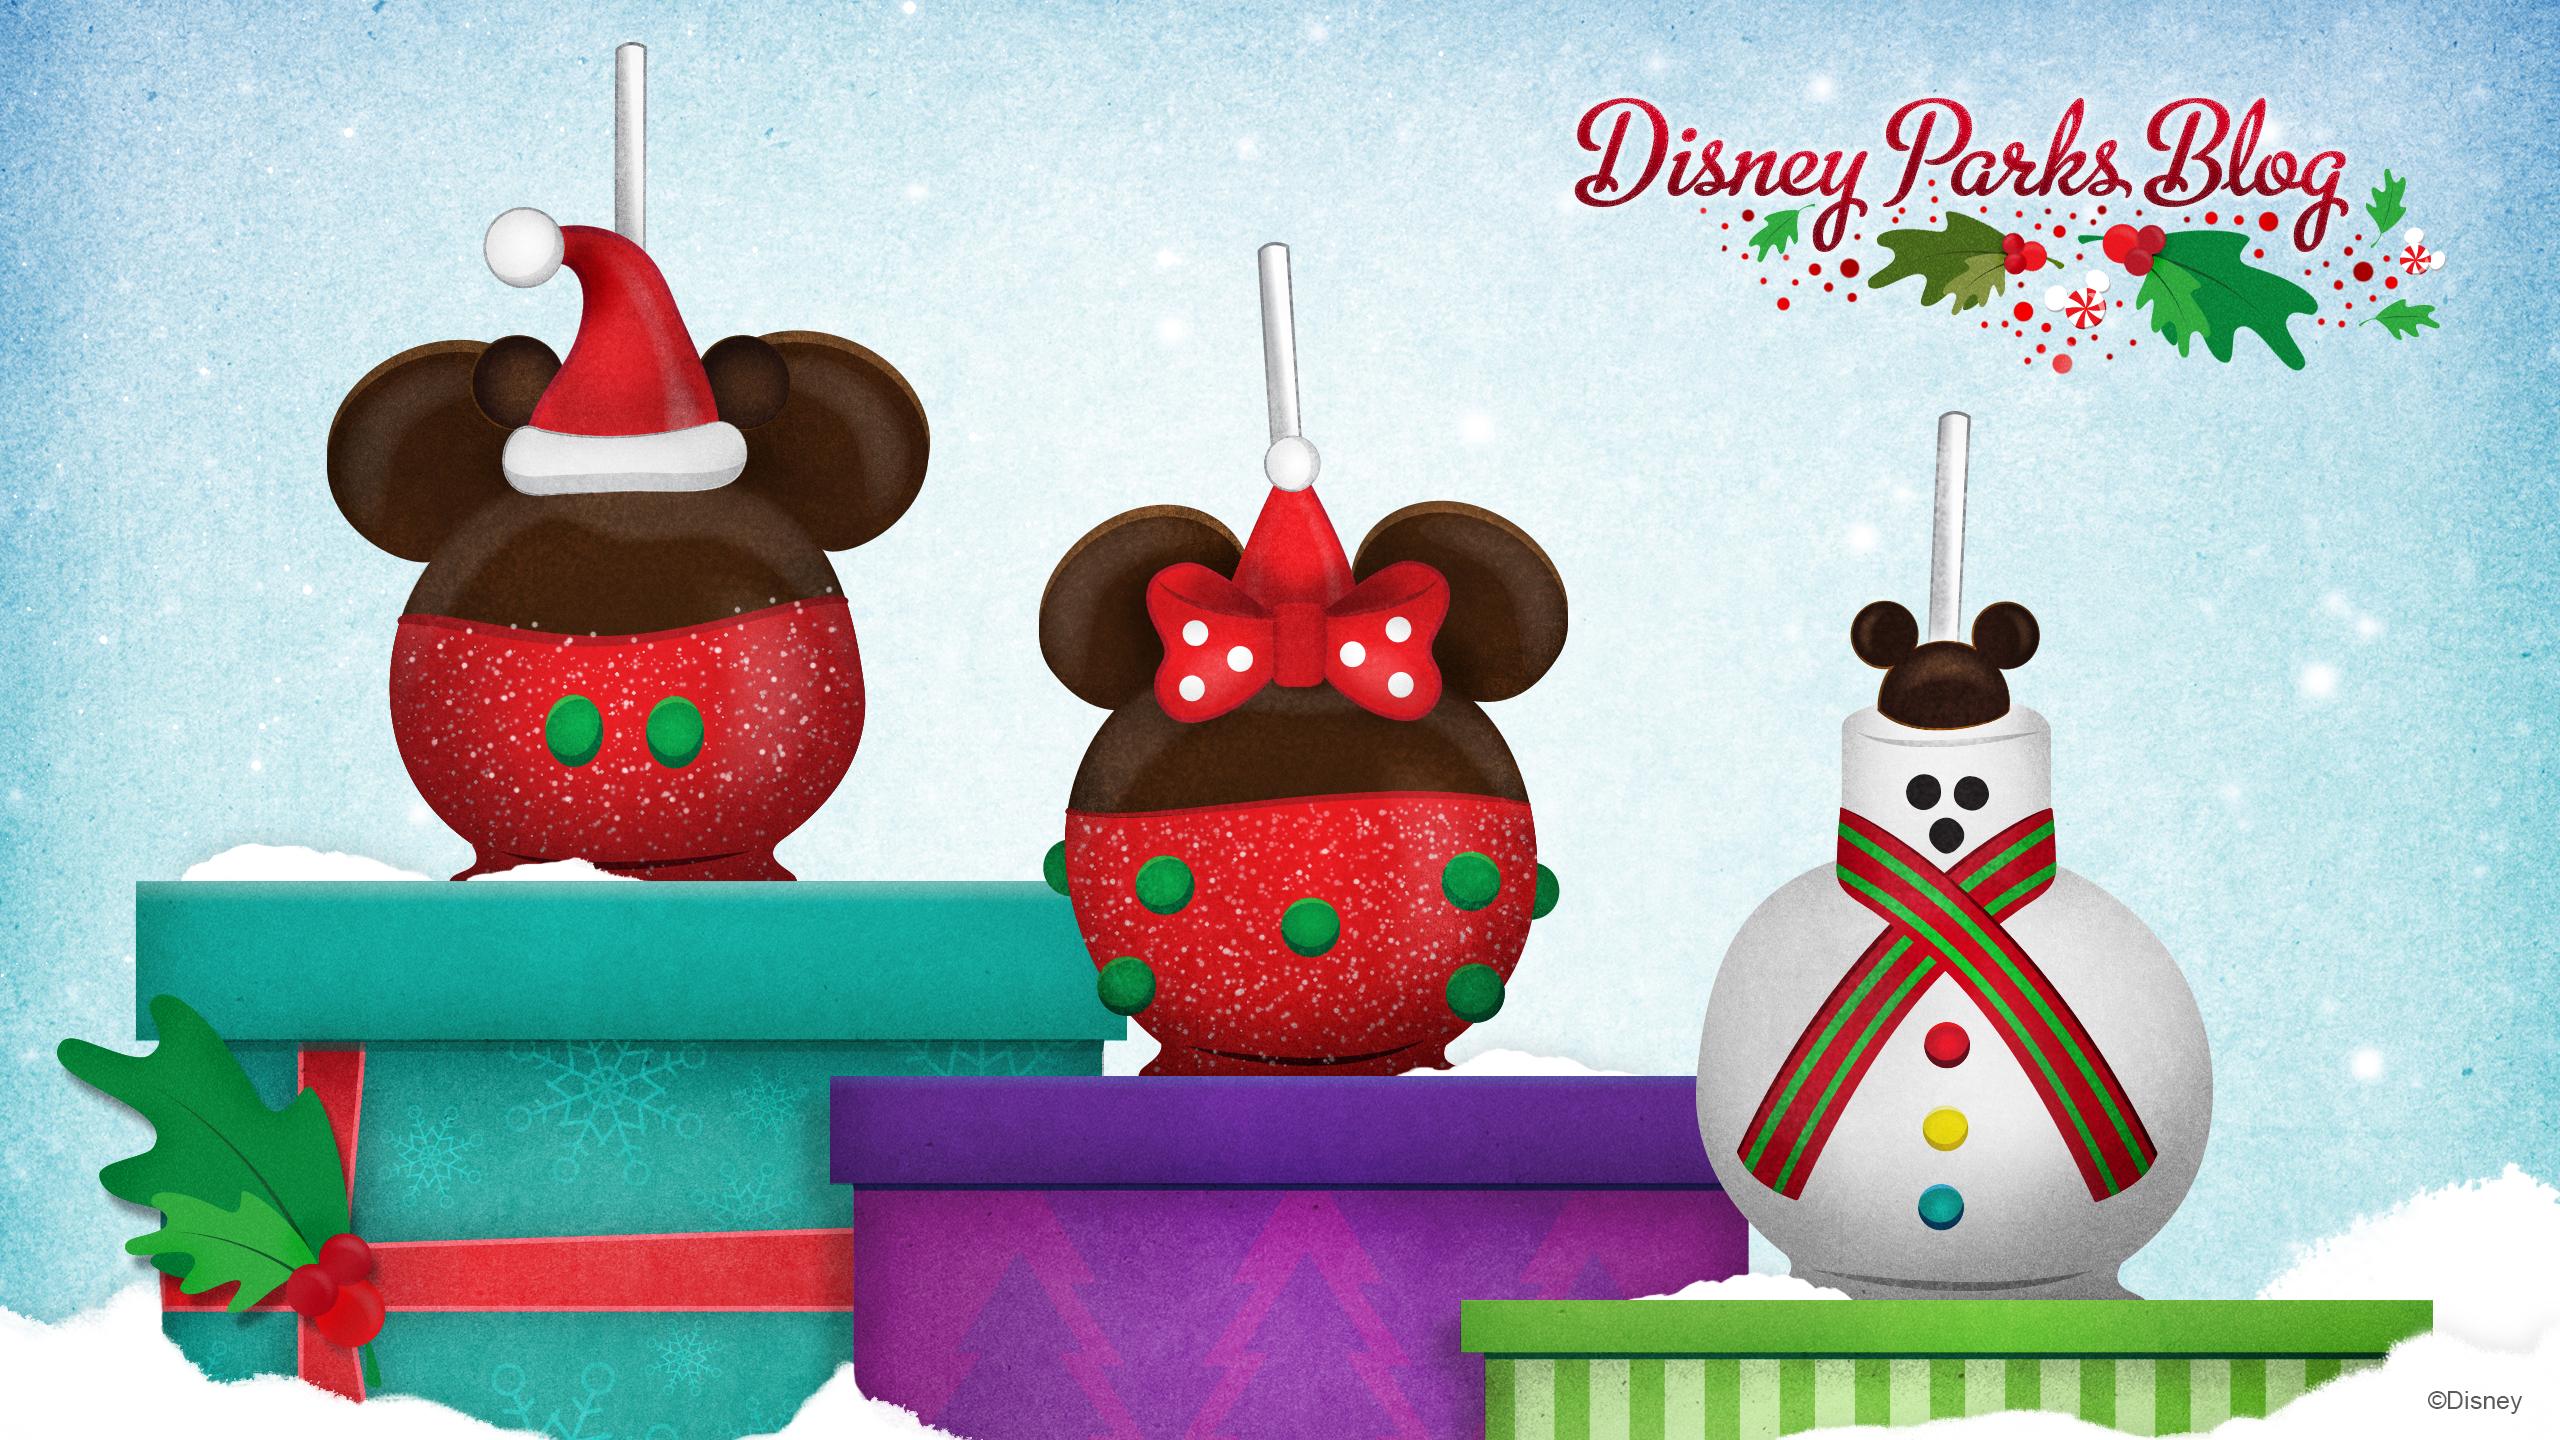 DesktopiPad Wallpapers Wallpaper Types Disney Parks Blog 2560x1440